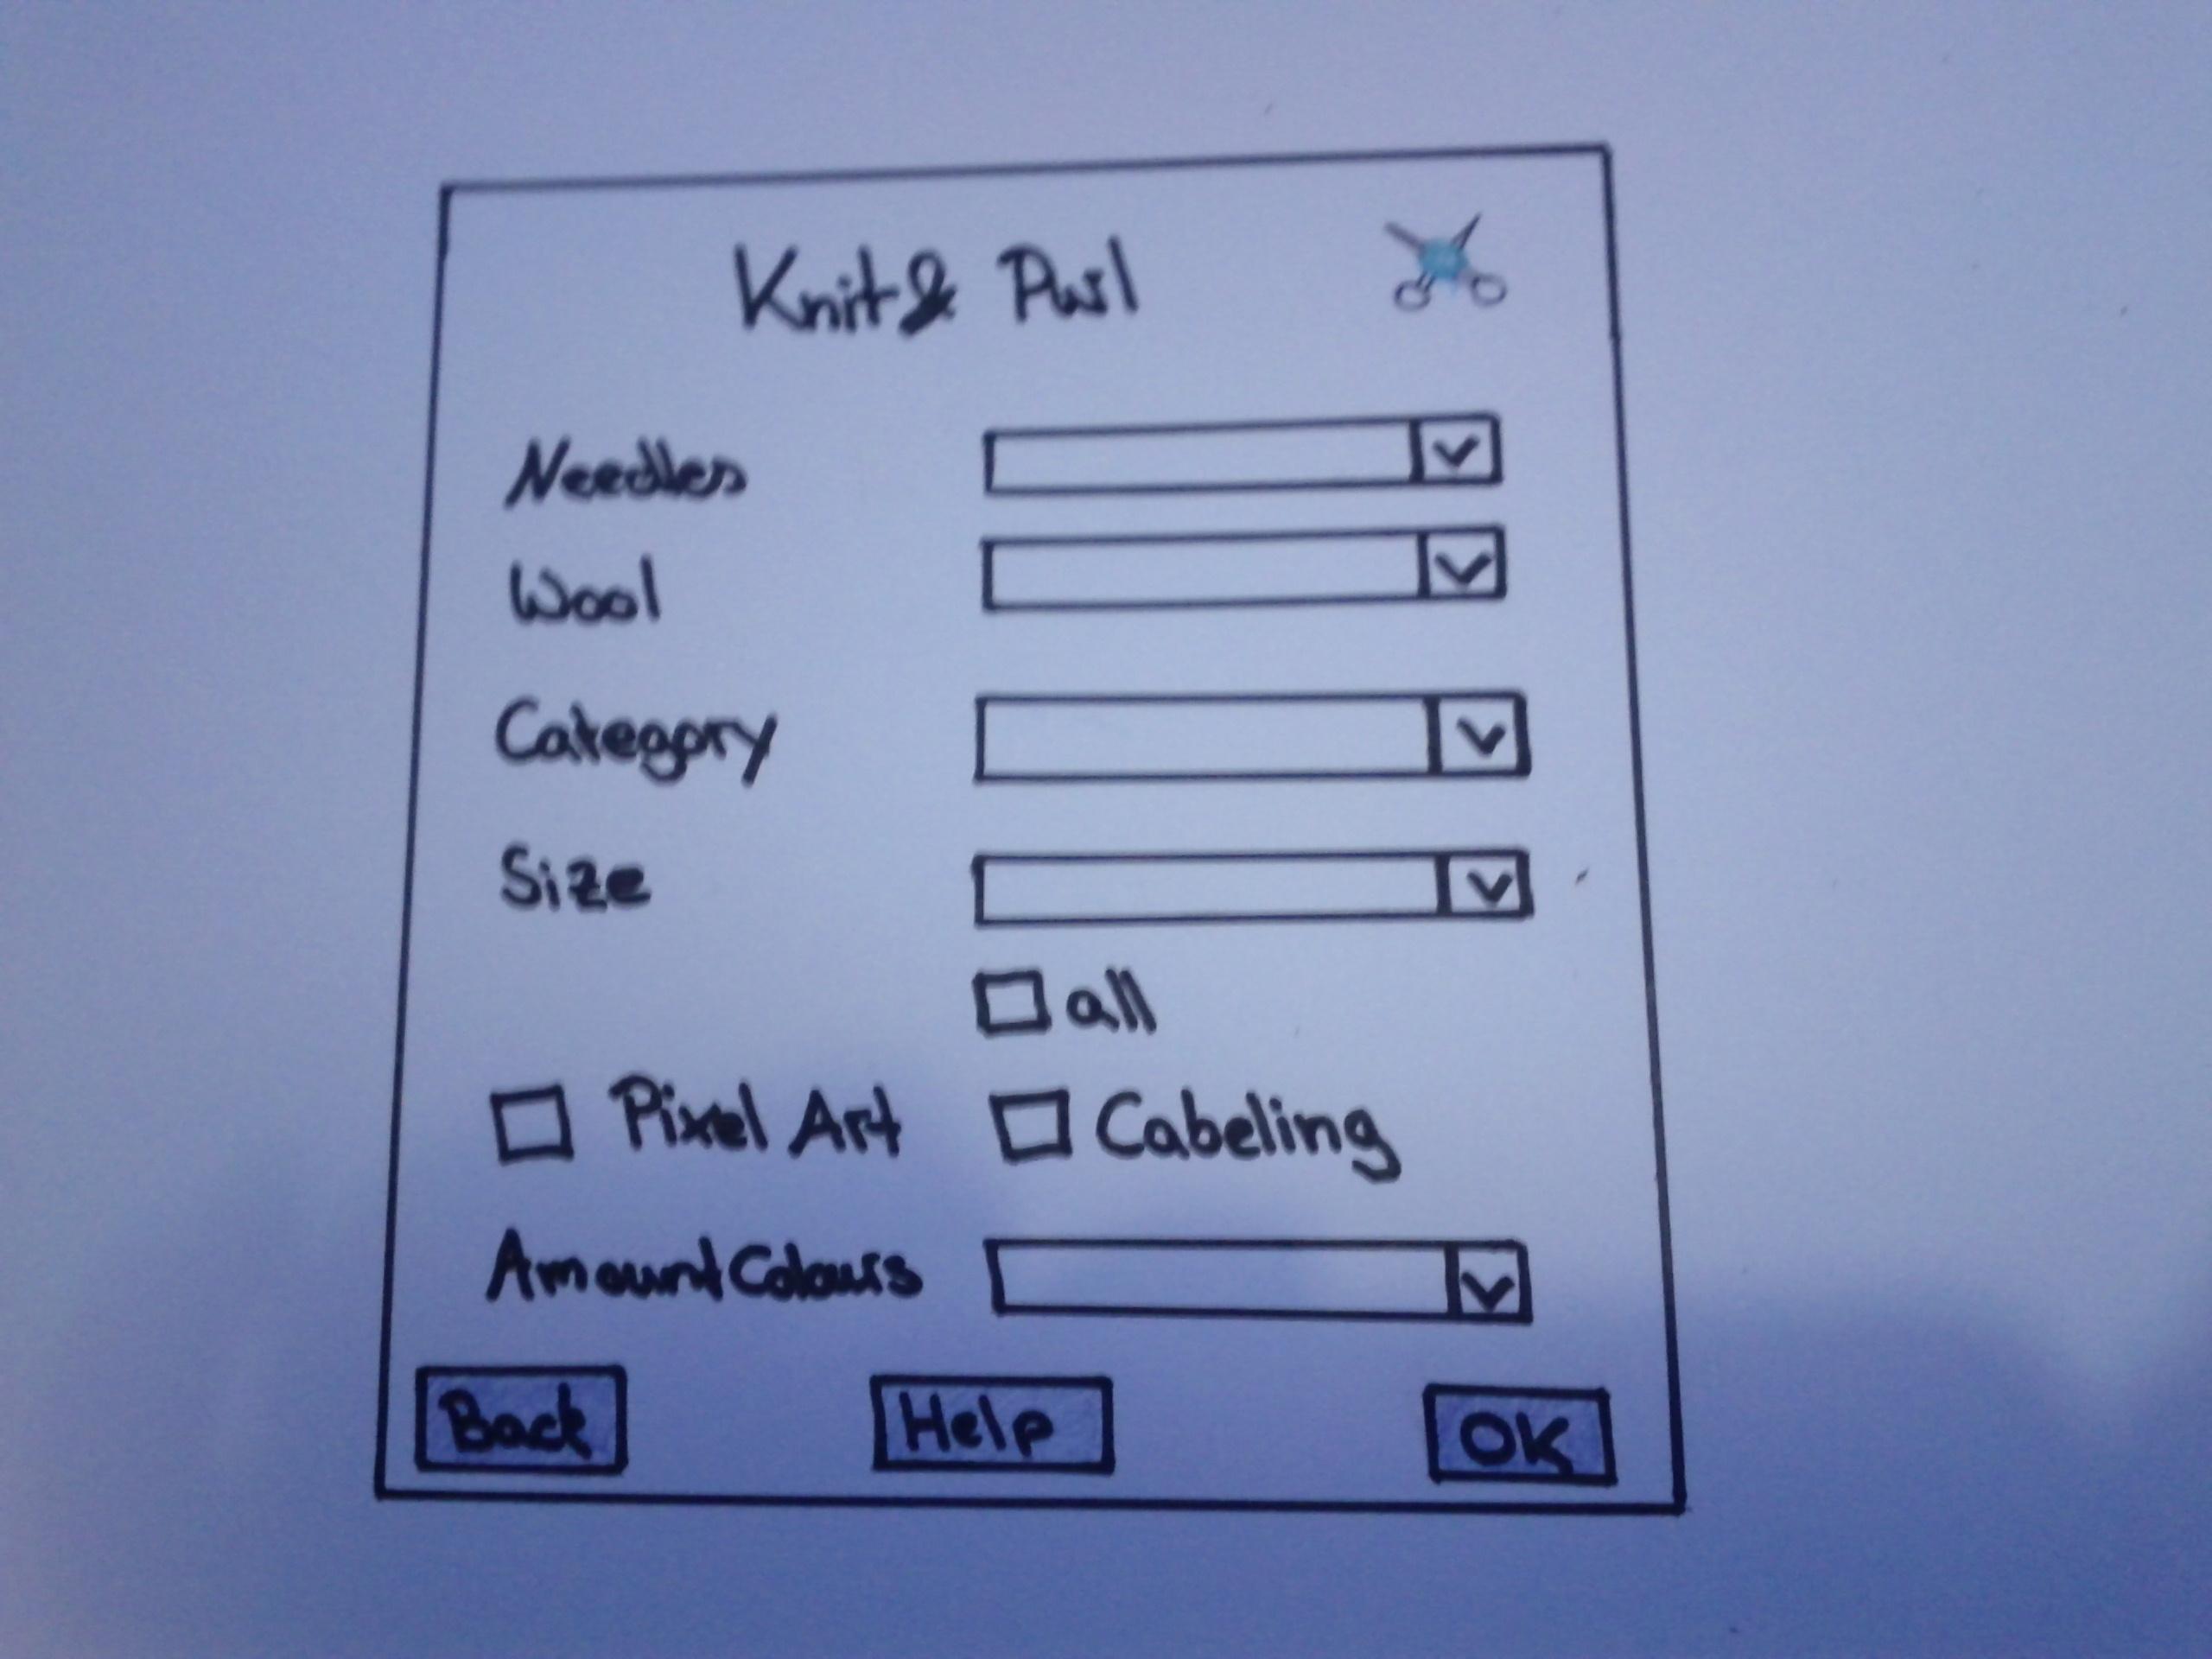 Knit & Purl – The Knitting Pattern Generator – Butterflies & Hurricanes